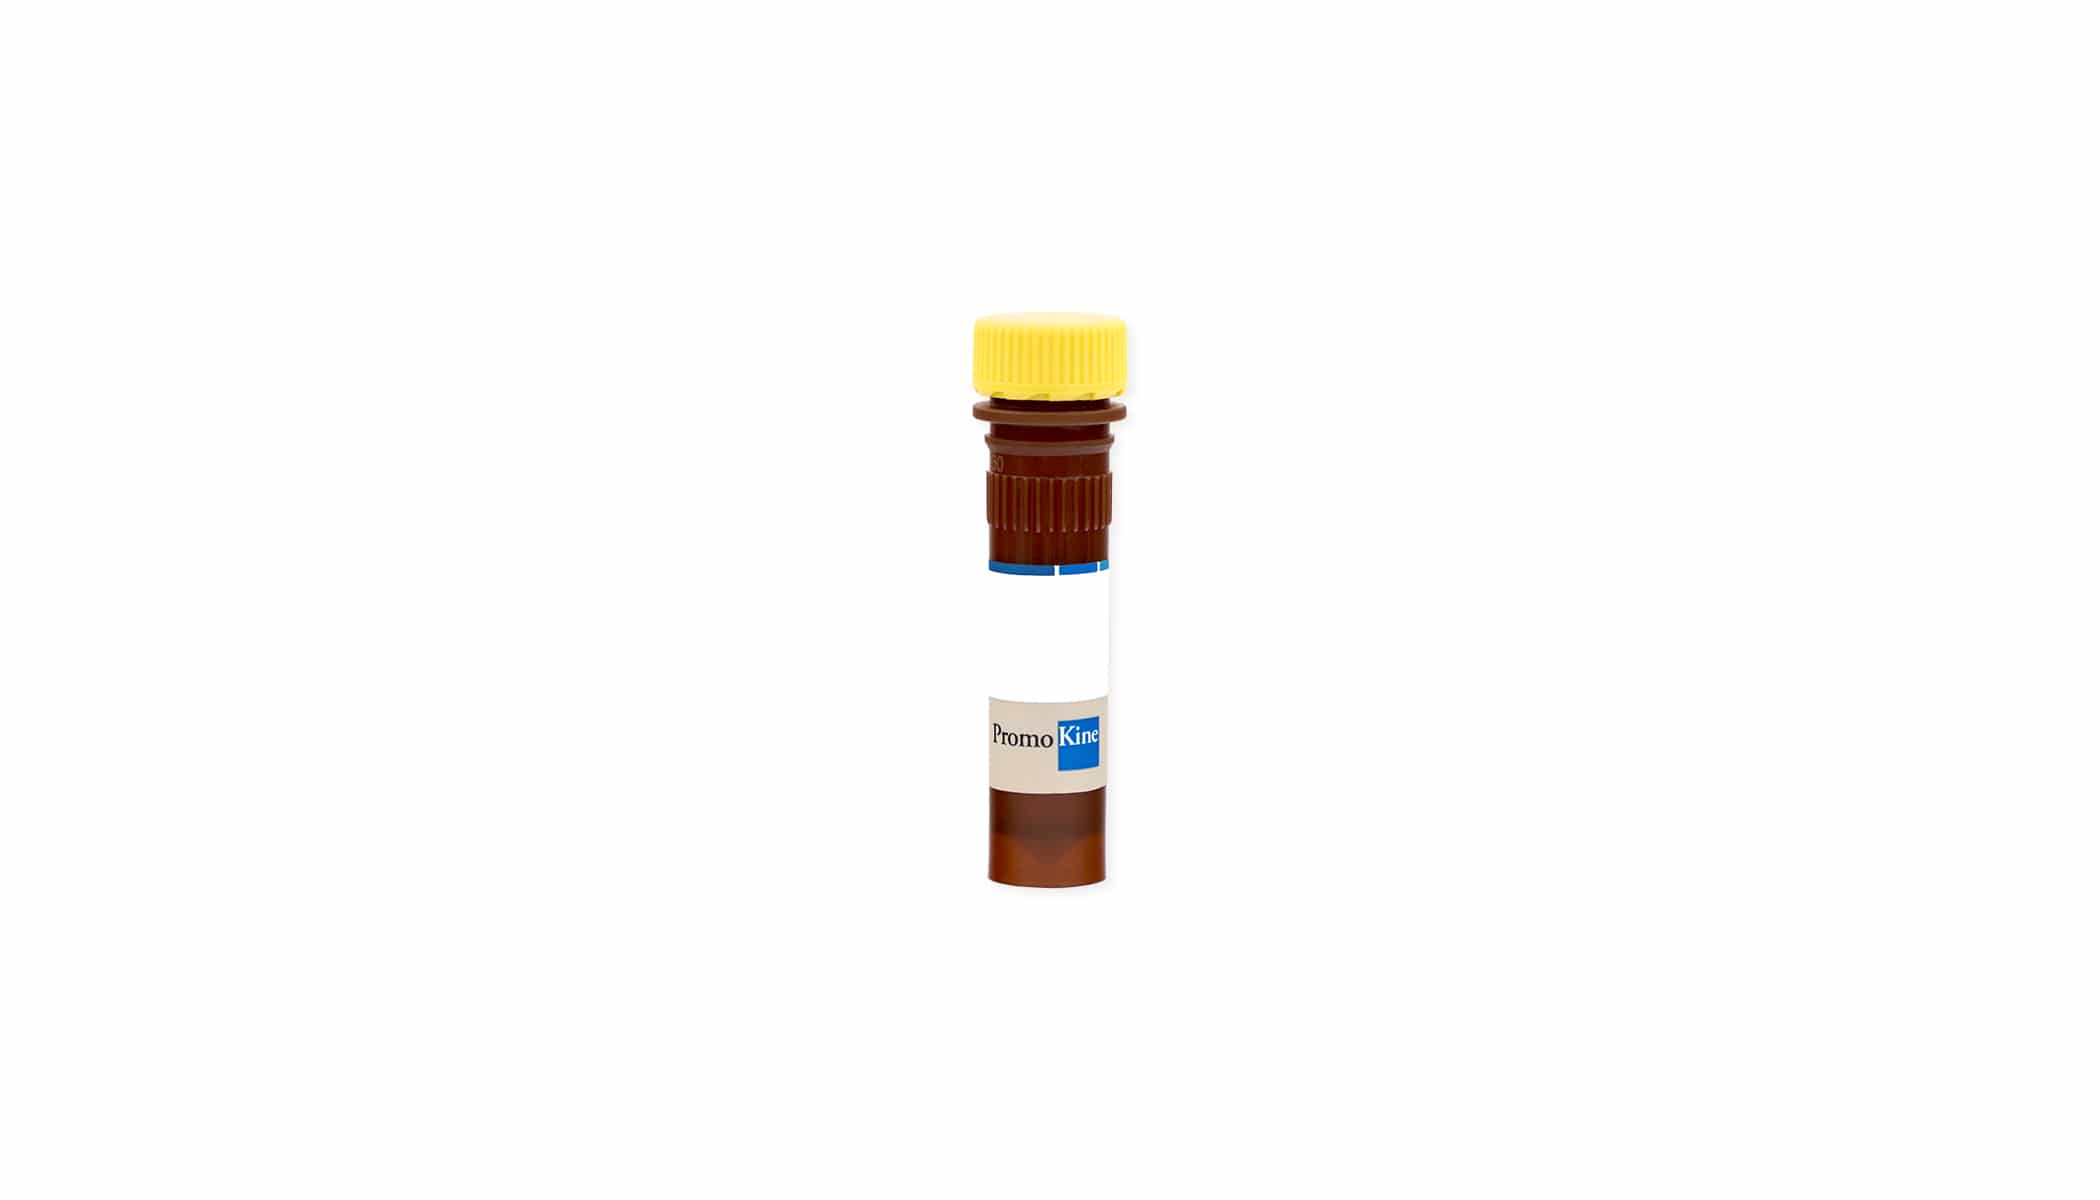 Caspase-9 Substrate LEHD-pNA